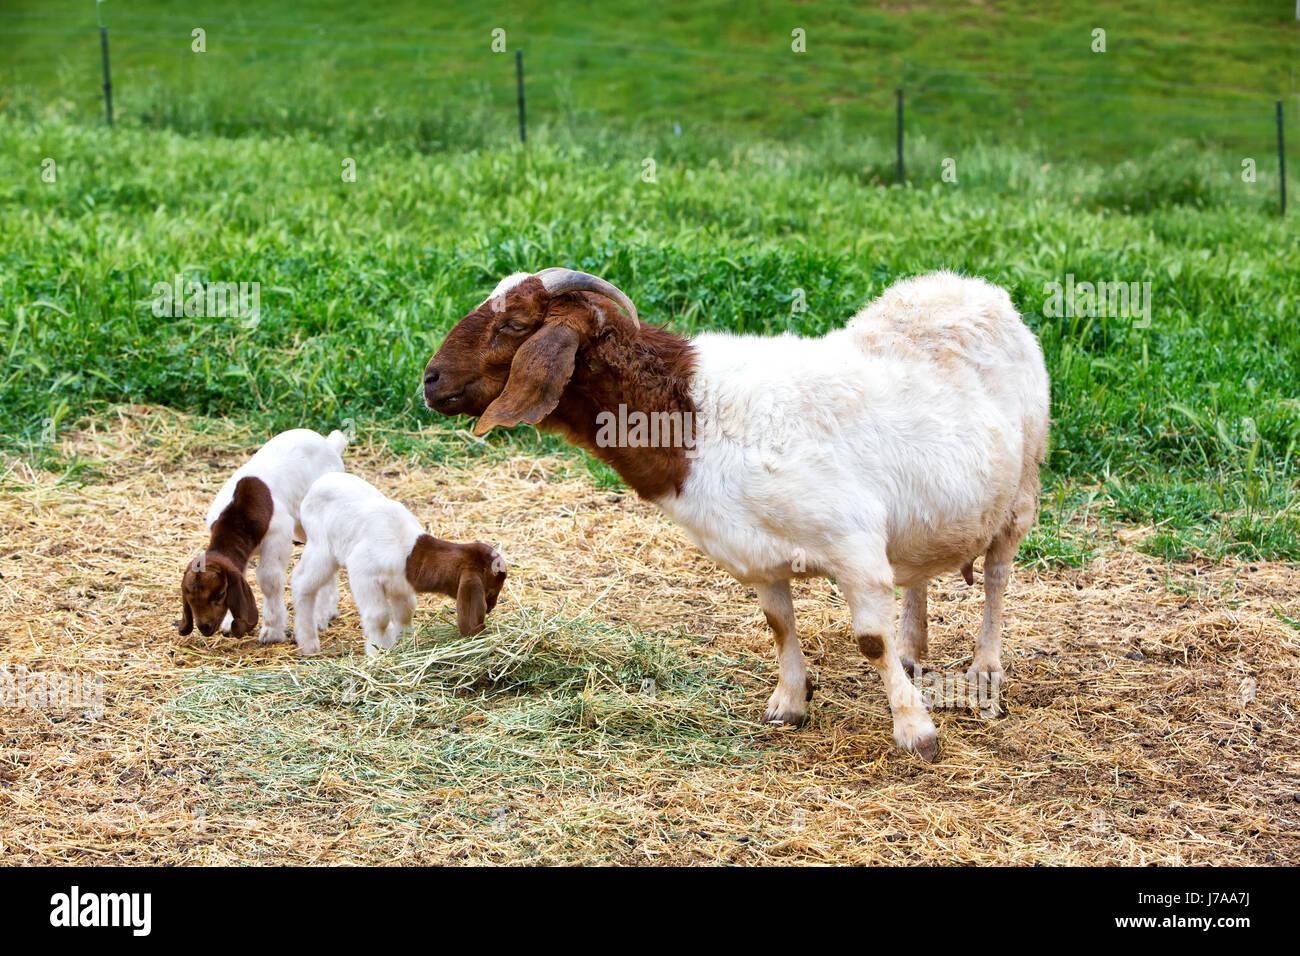 Motherhood Stockfotos & Motherhood Bilder - Alamy